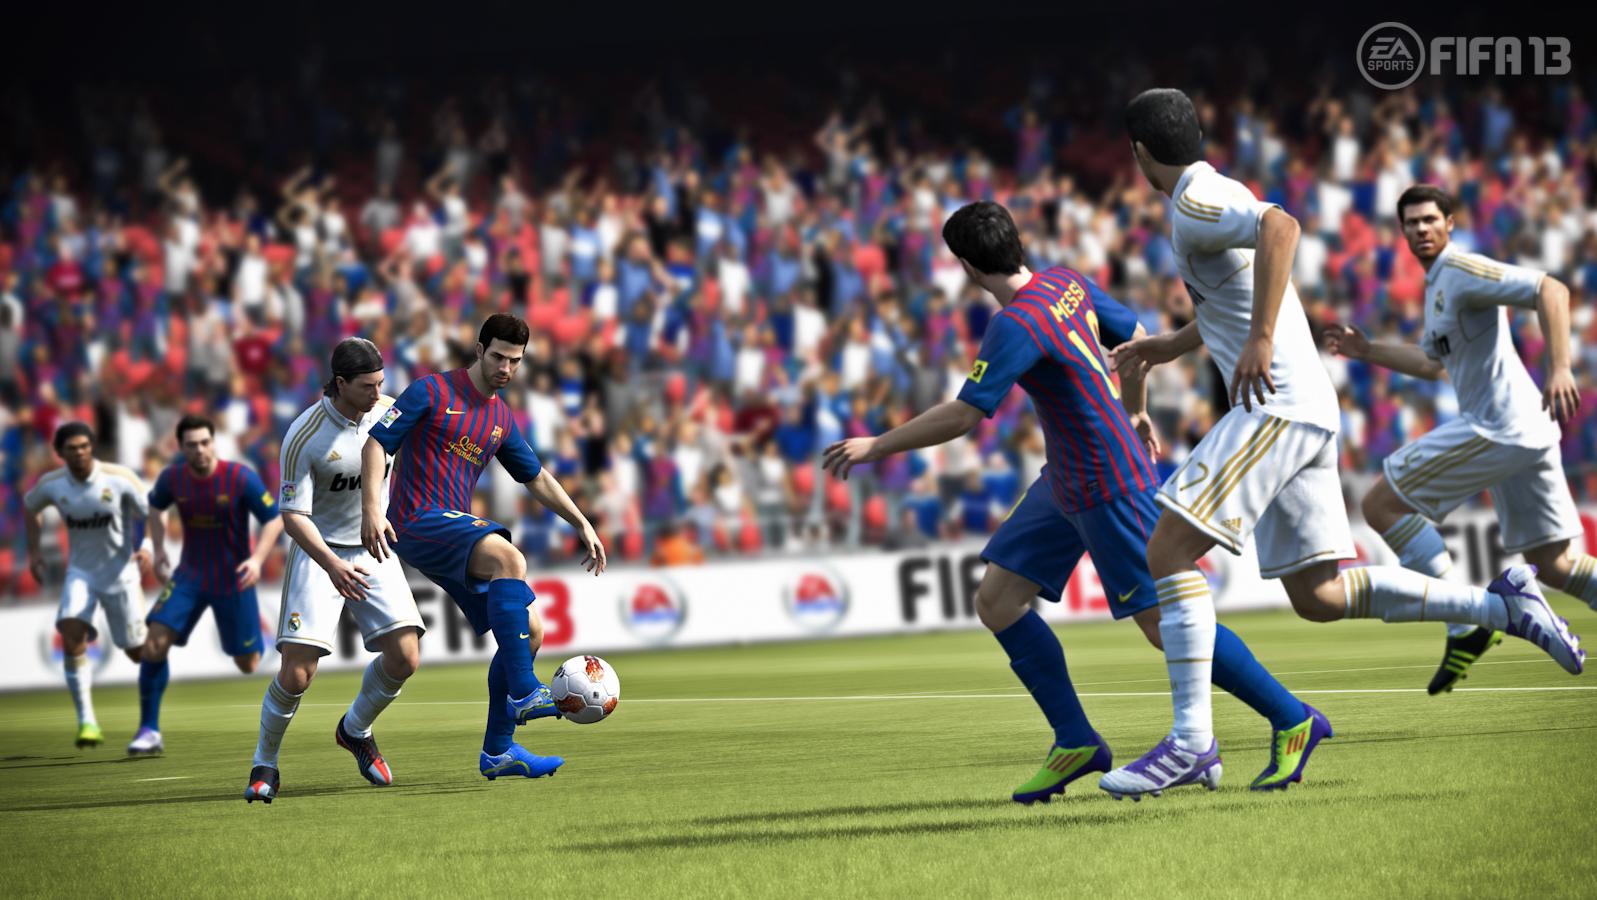 Primeras screenshots de FIFA 13 parecen reales!!! [¿Donde Está Alexis?] #E3